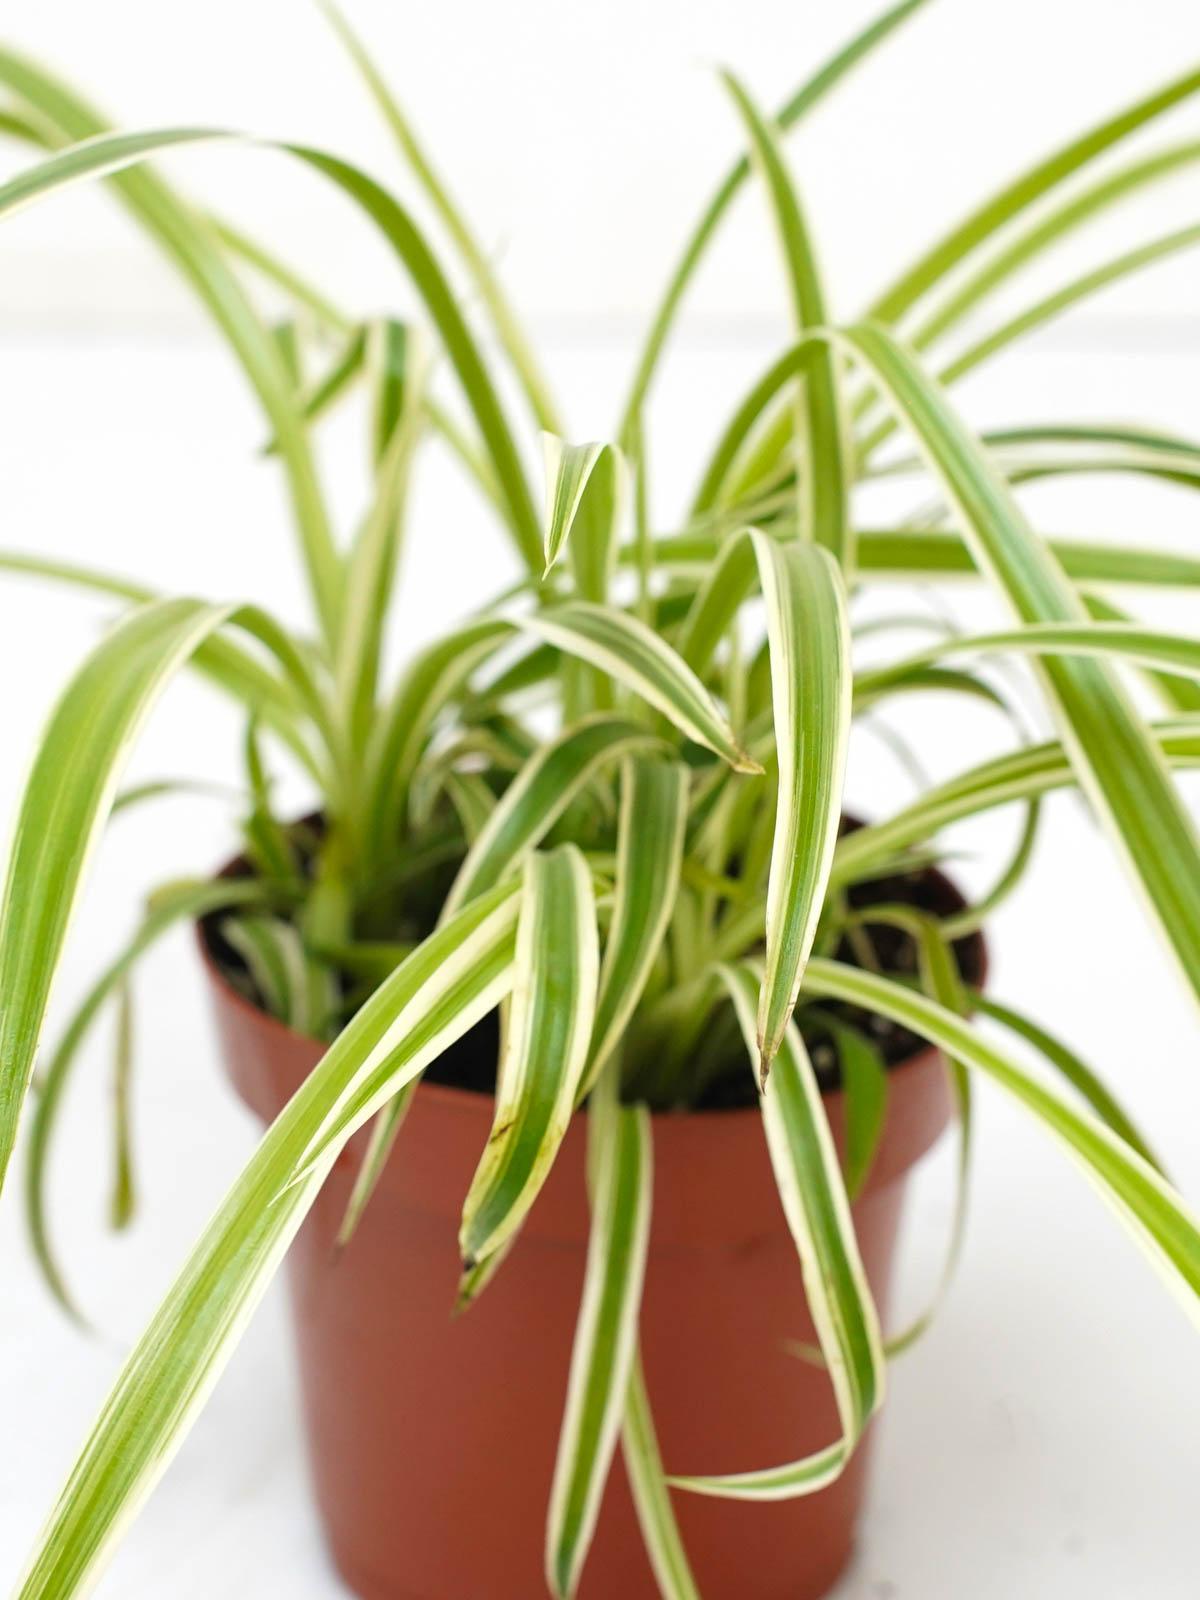 Chlorophytum Plant 'Indoor Plants'